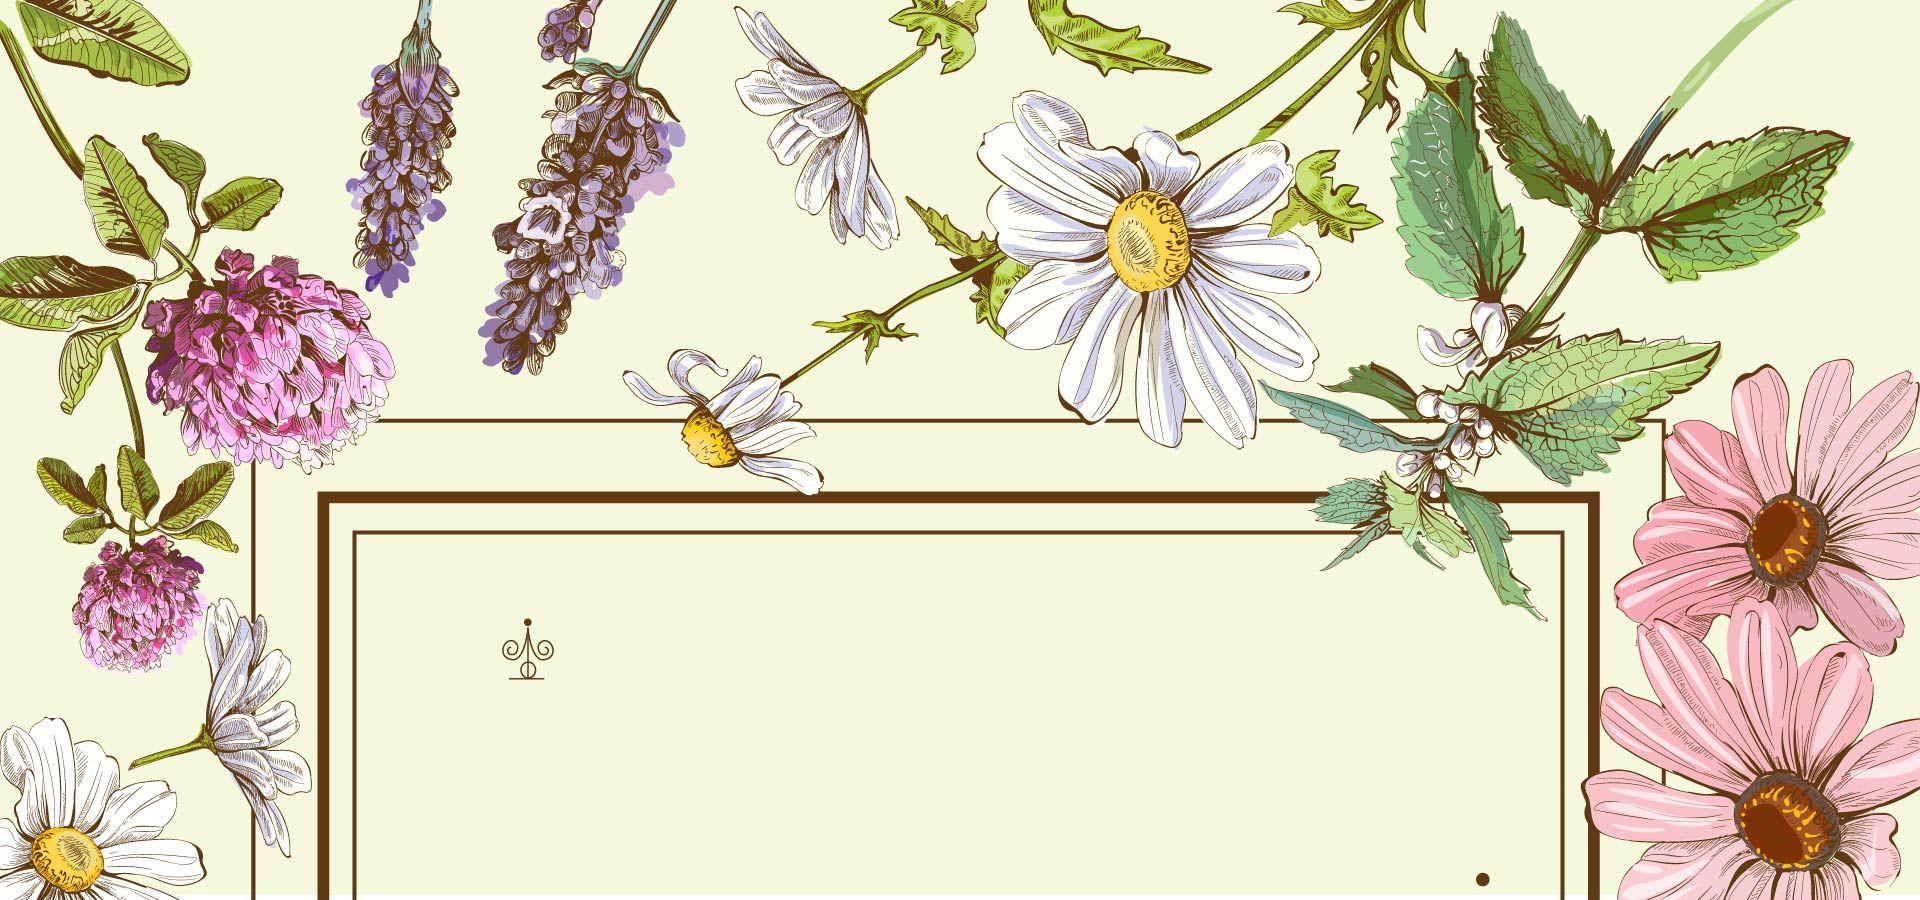 برواز الزهور زهرة تصميم Floral Painting Literature Art Floral Decor